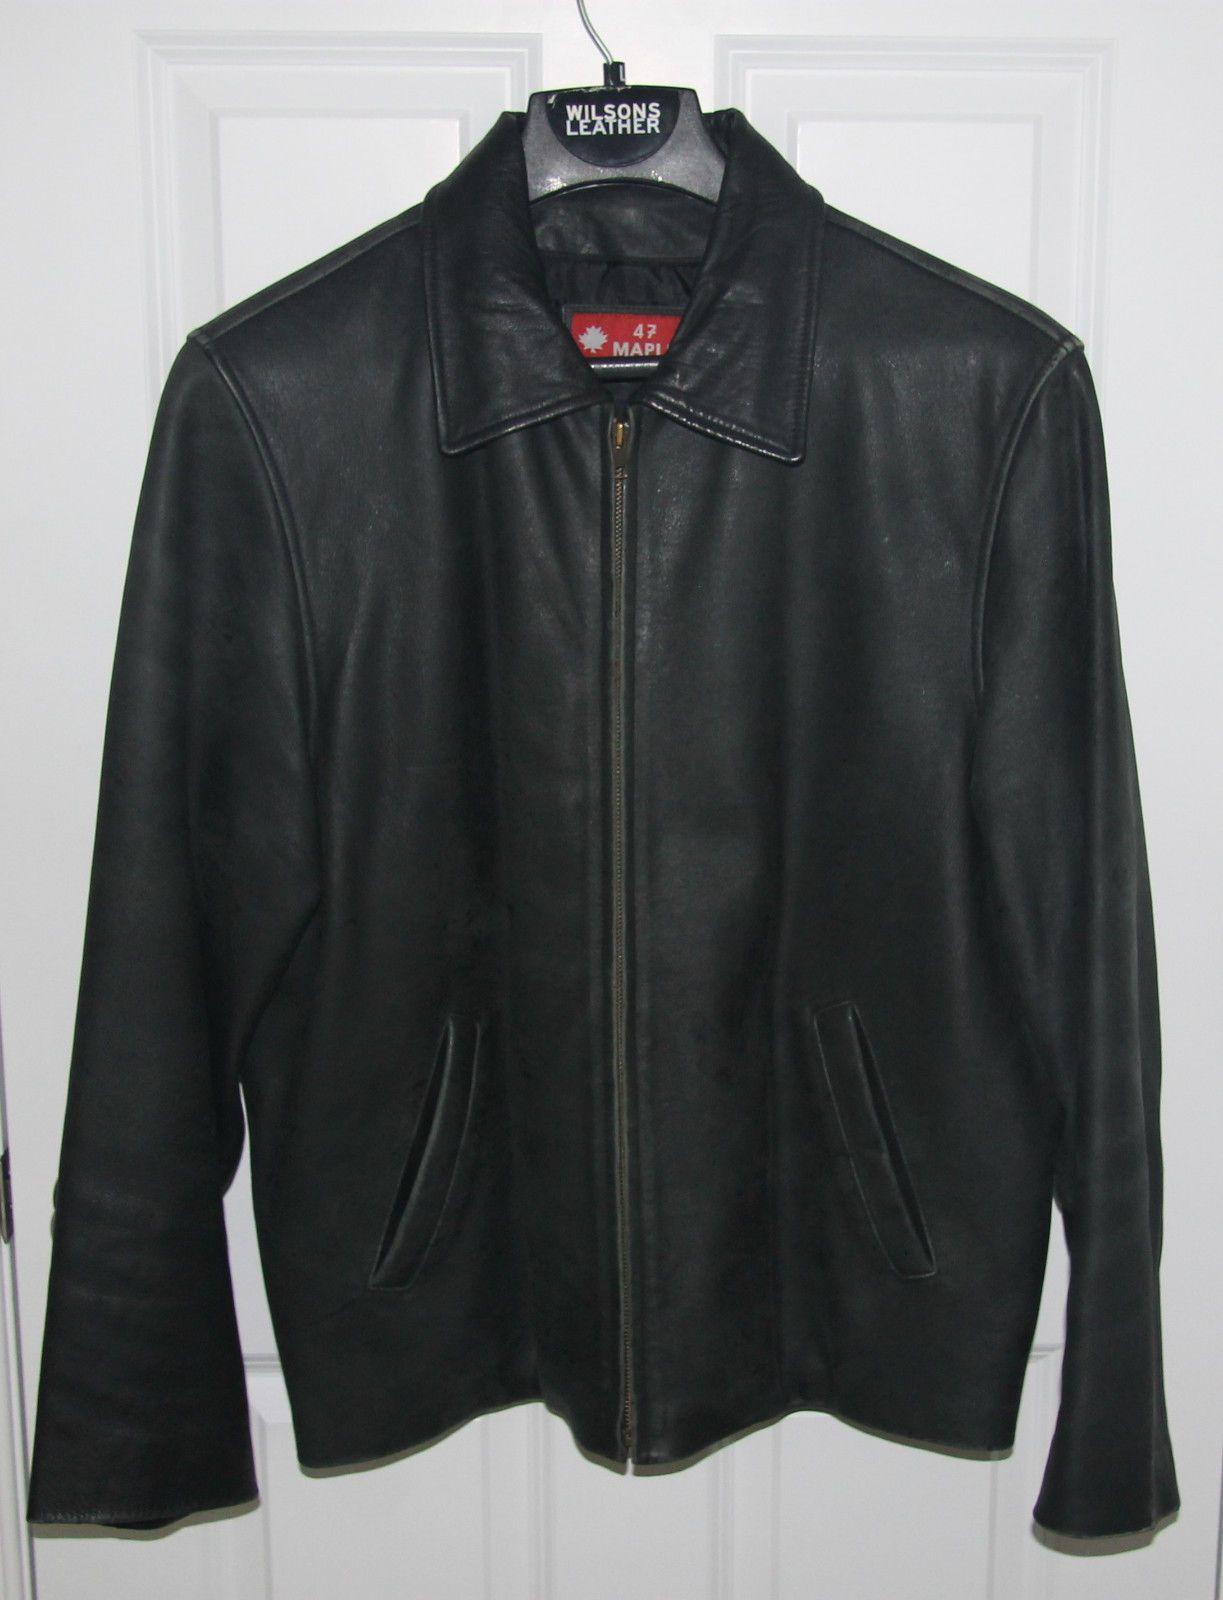 MAPLE Men's Solid Black Leather Jacket Size L https://t.co/hjwrpuuq9L https://t.co/uZIdVnsUZs http://twitter.com/Xuisxa_Geertu/status/773813574552719360